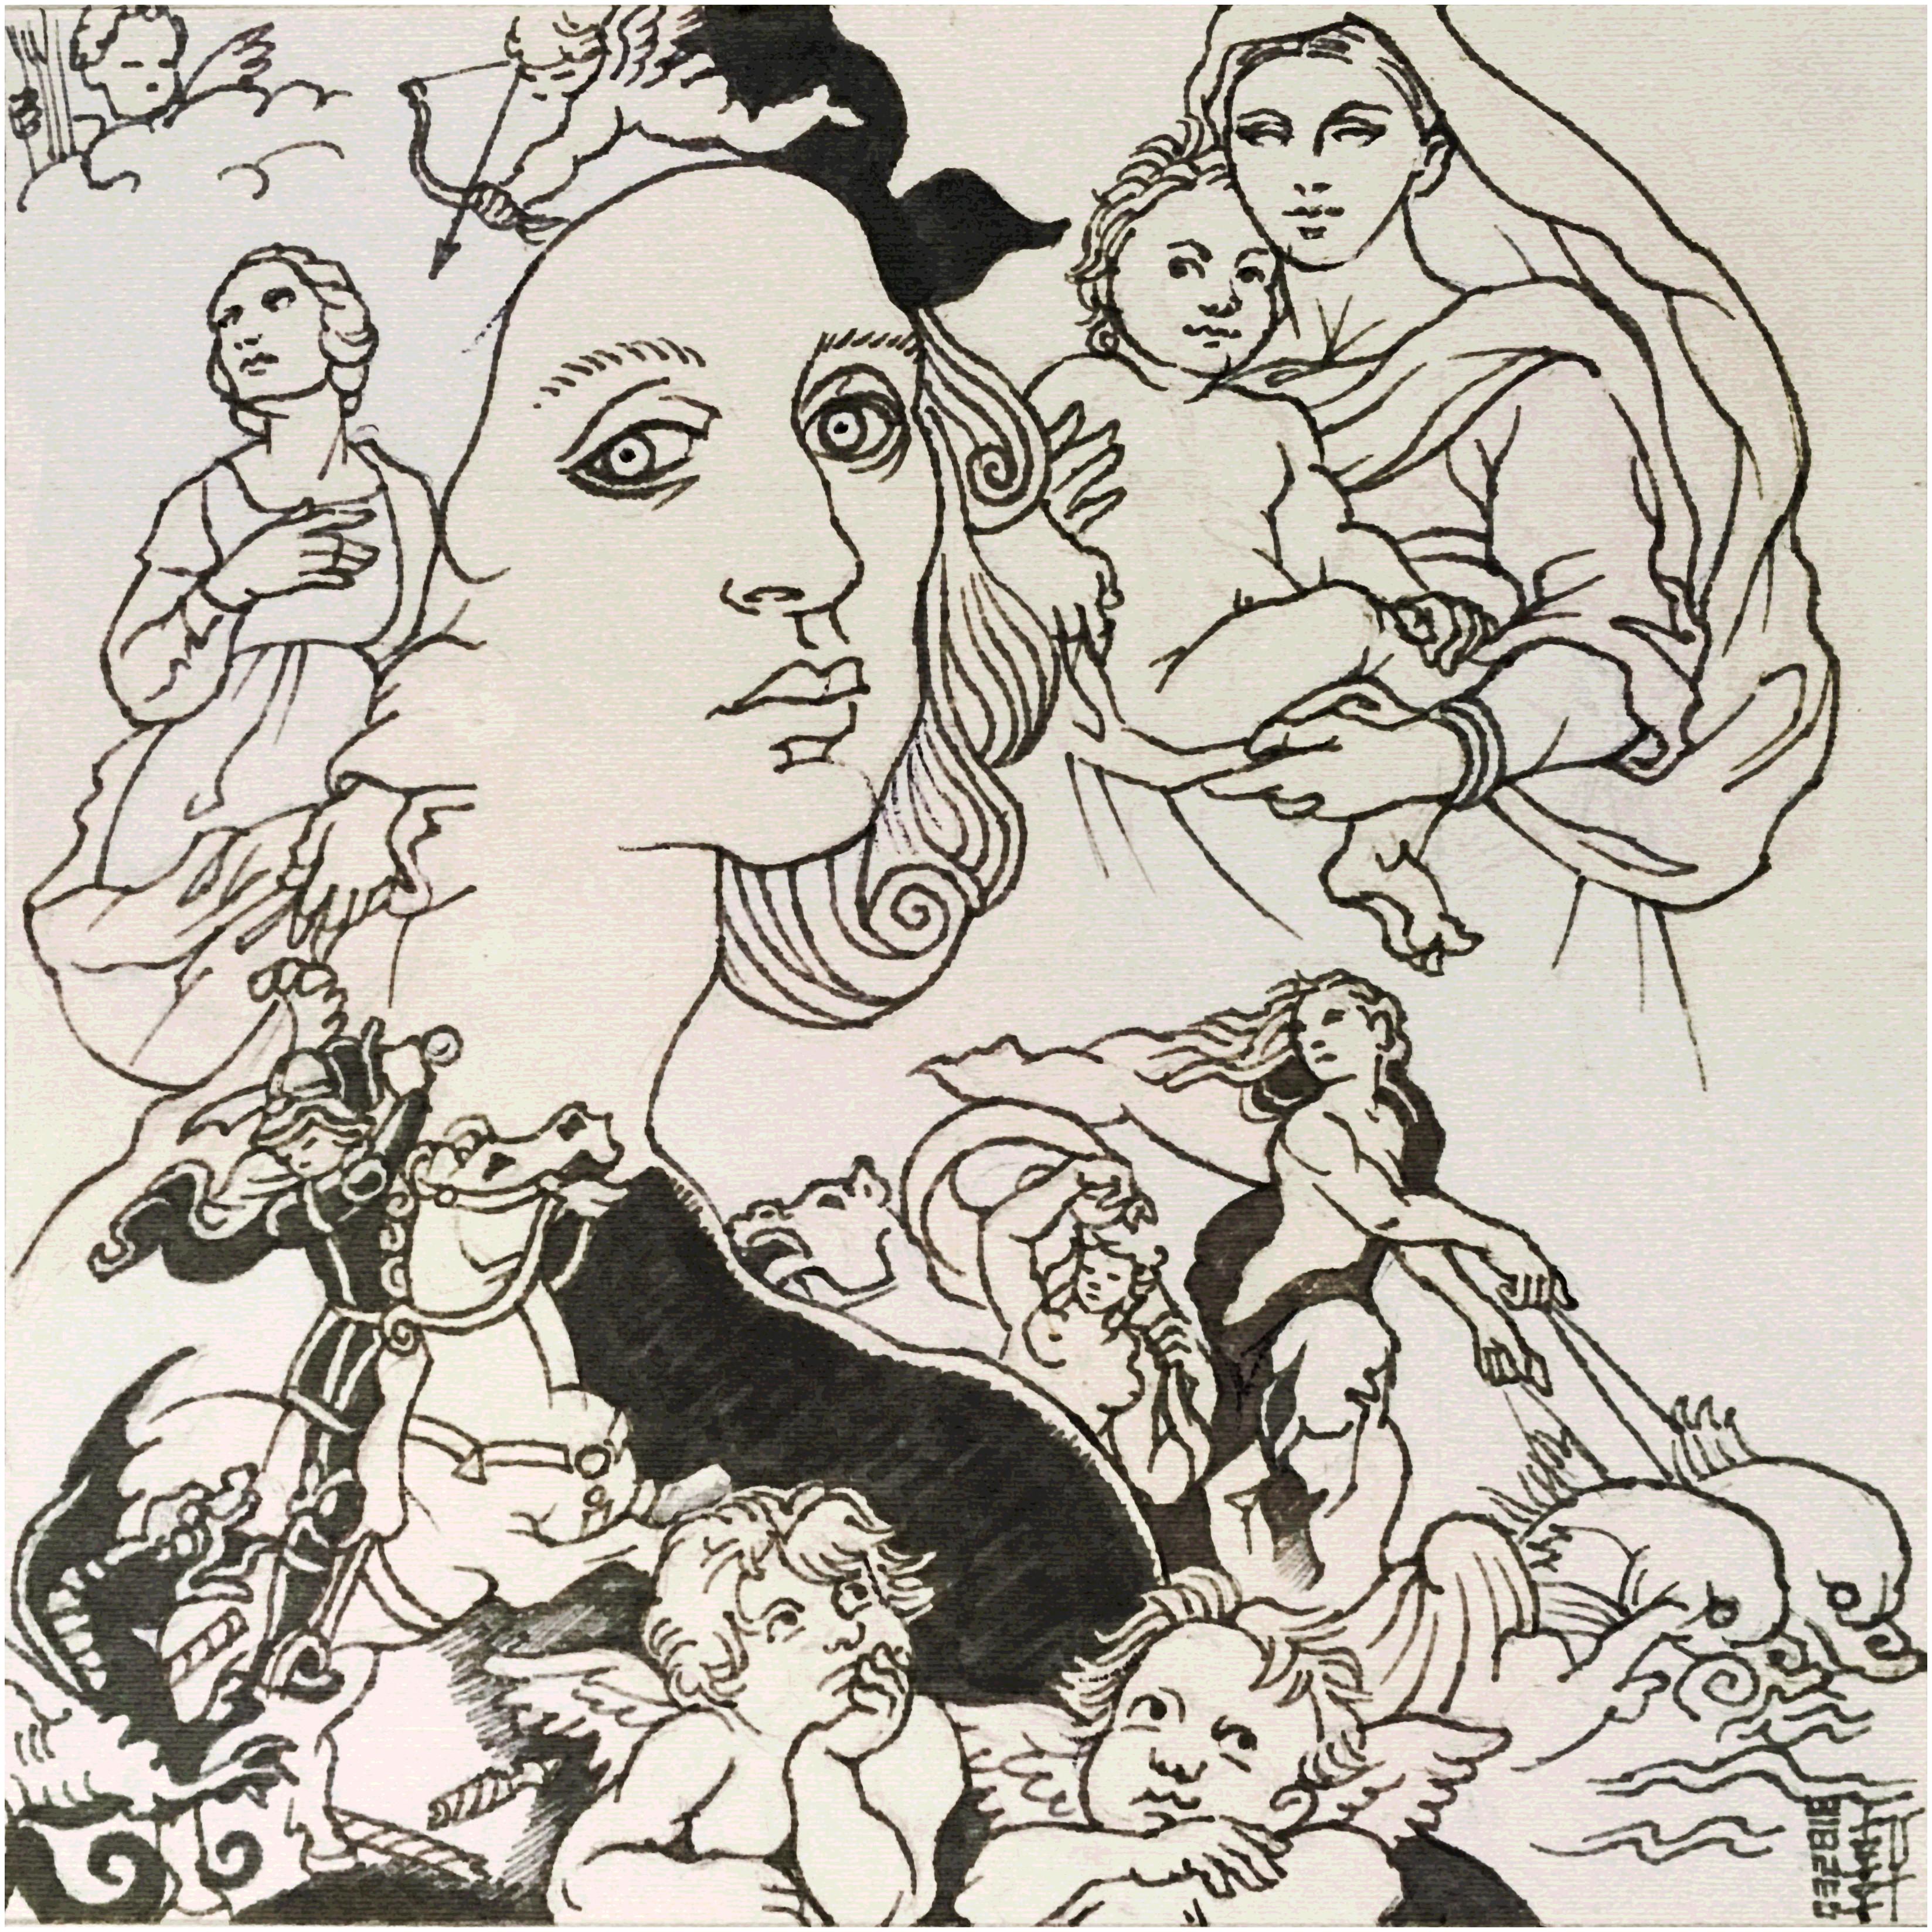 Day 03-28-18 - Raphael Sketch